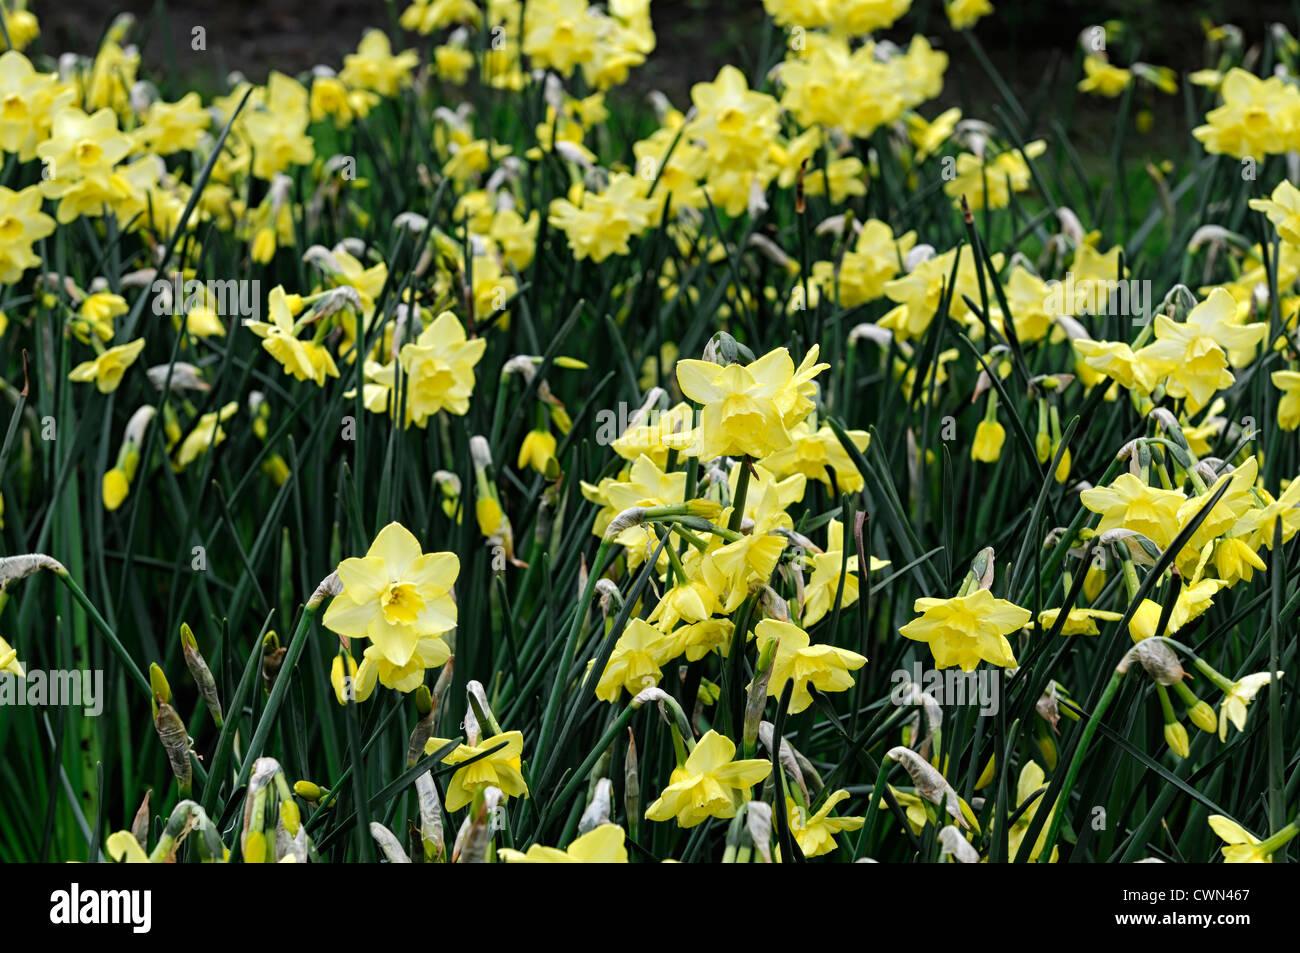 Narcissus regeneration yellow spray multi headed daffodil flowers drift bed spring bulb flowering bloom blossom - Stock Image